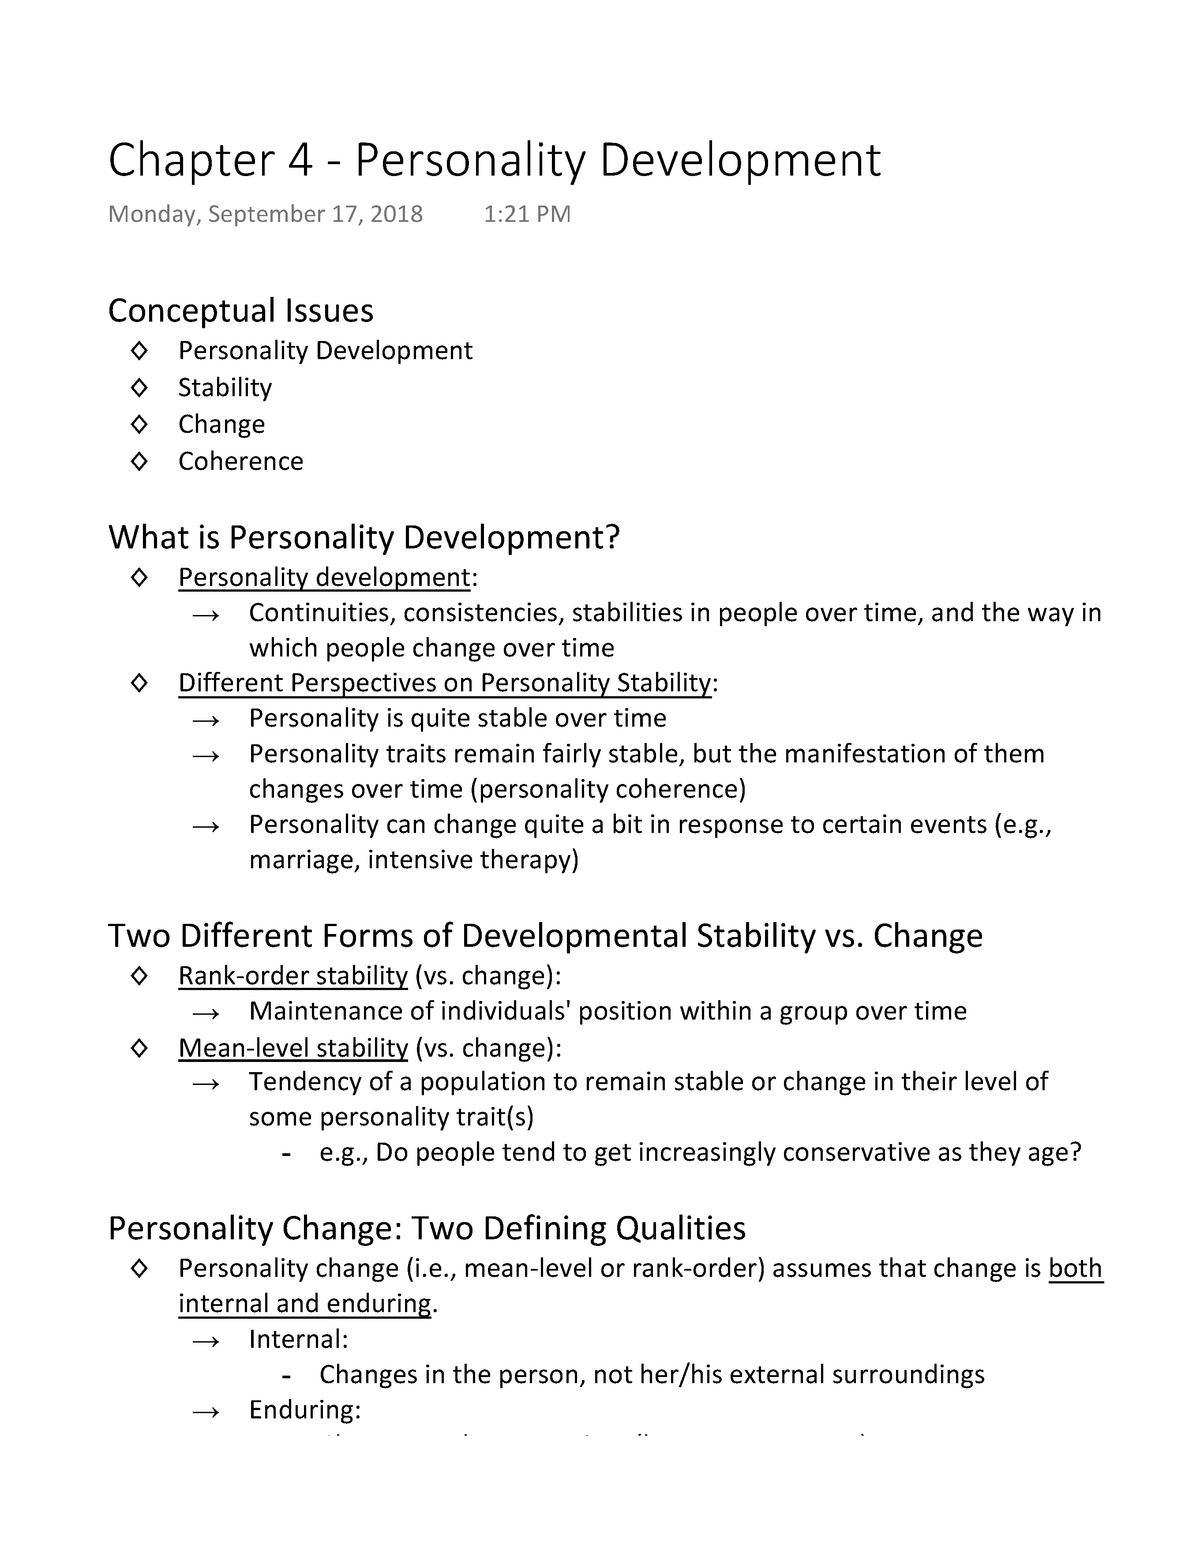 Chapter 4 - Personality Development - 3750 480-002 - StuDocu